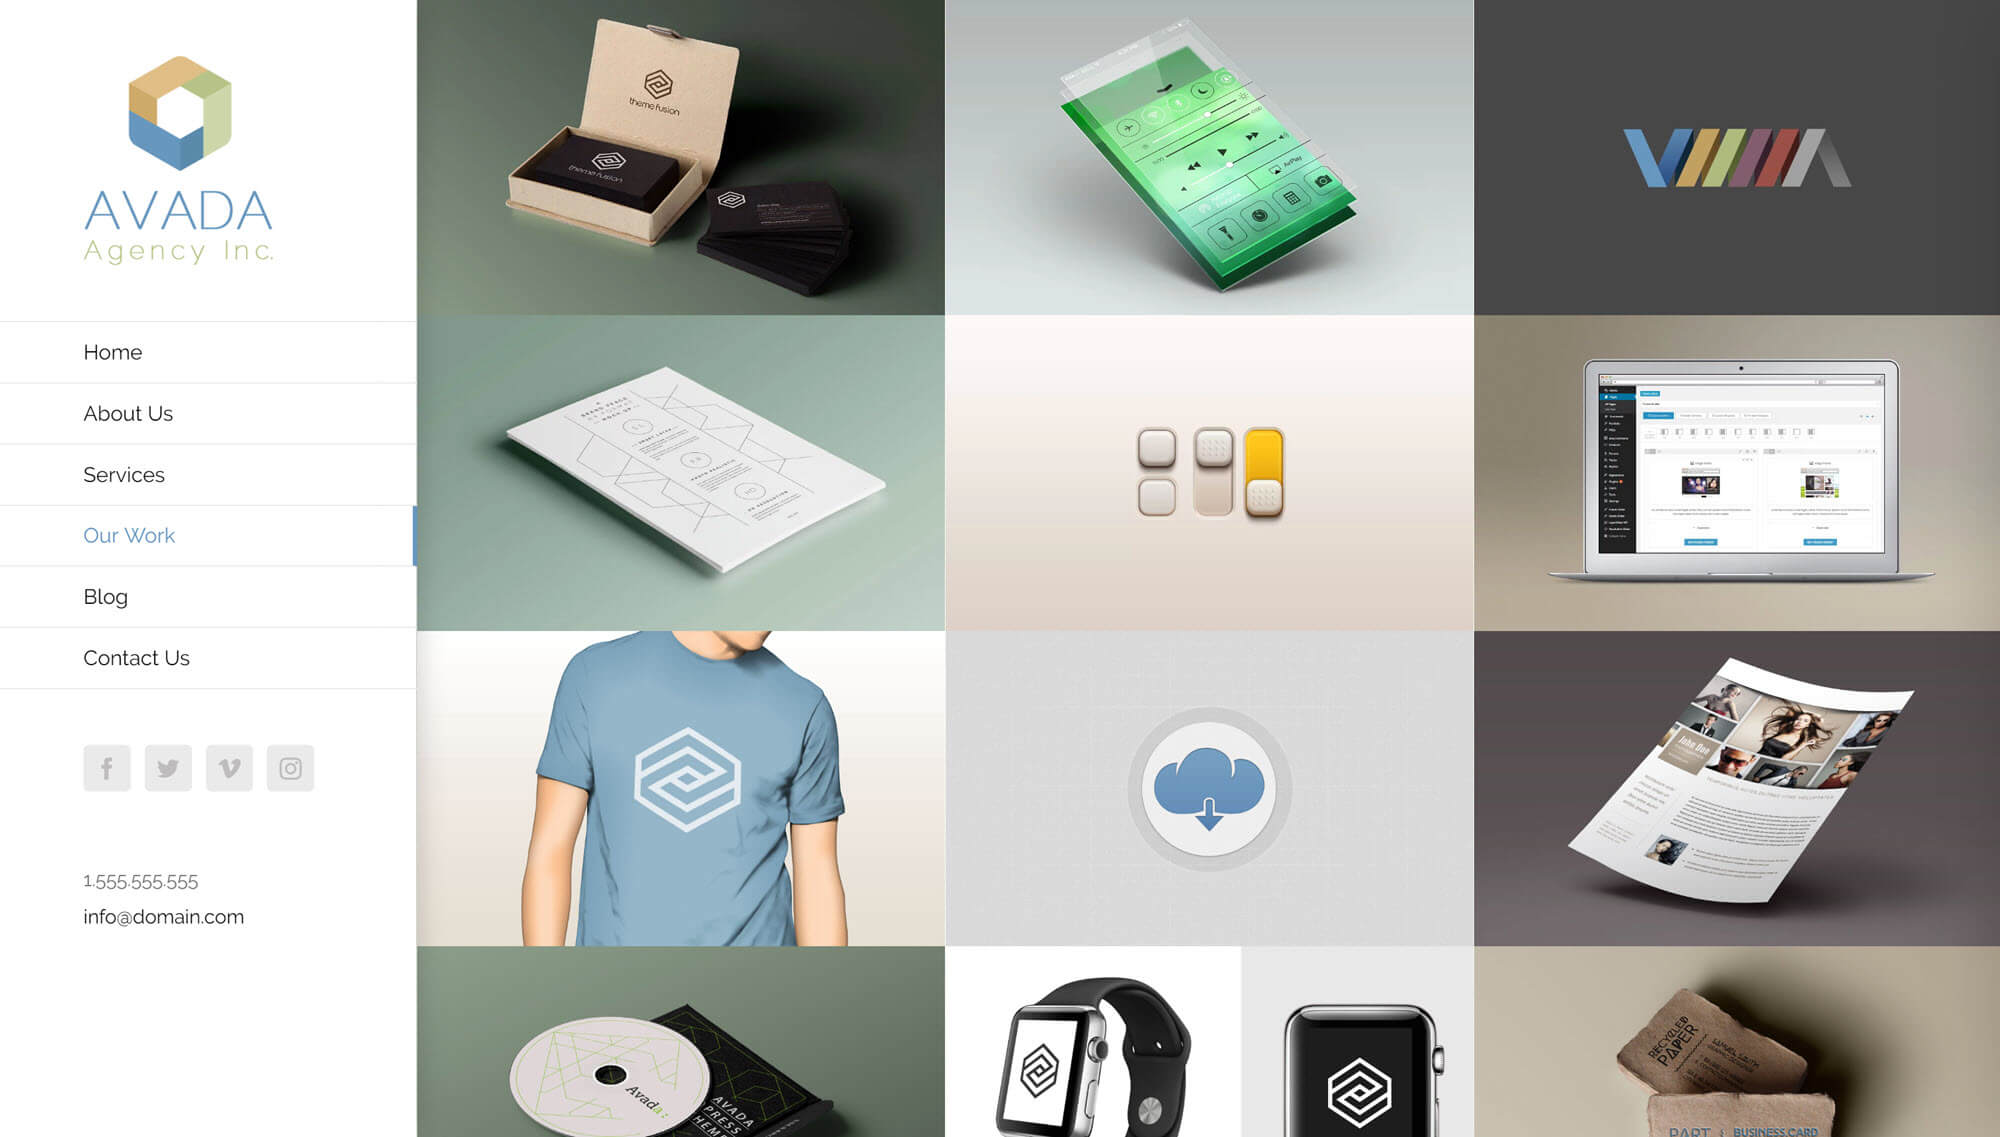 Avada Agency Website Demo